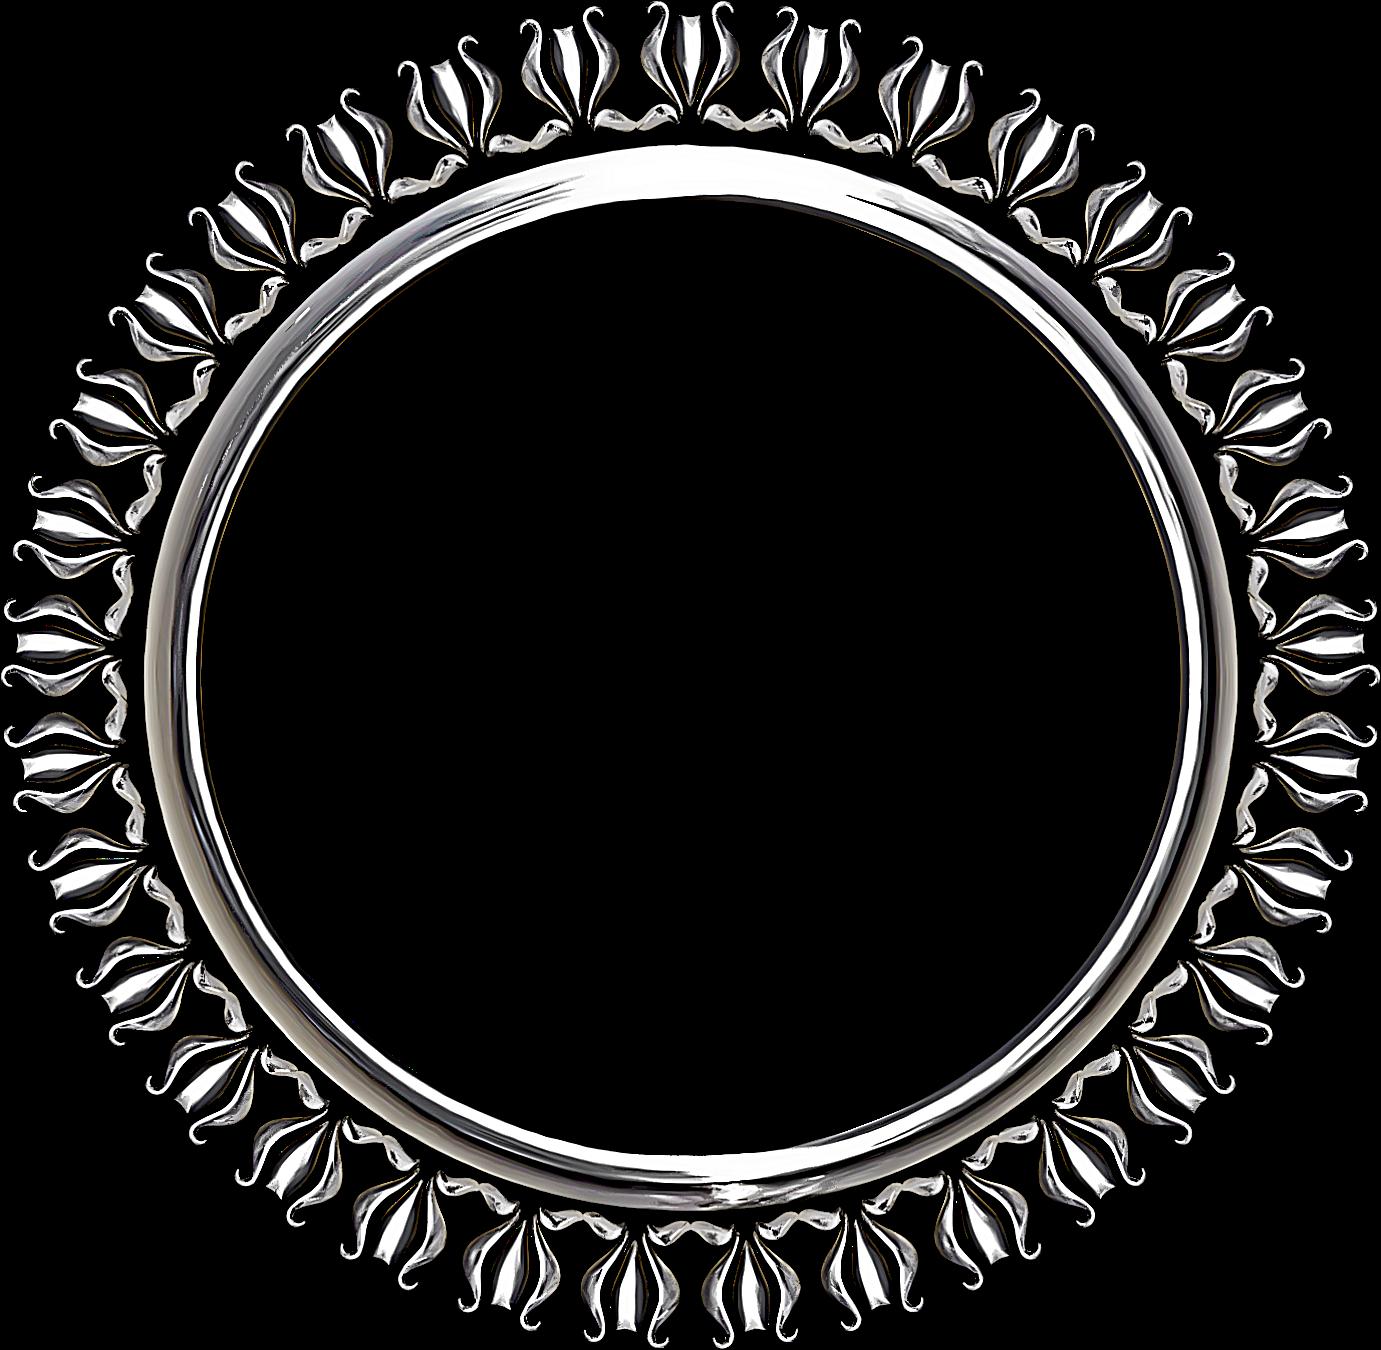 Metal border png. Keychain ring circular transprent